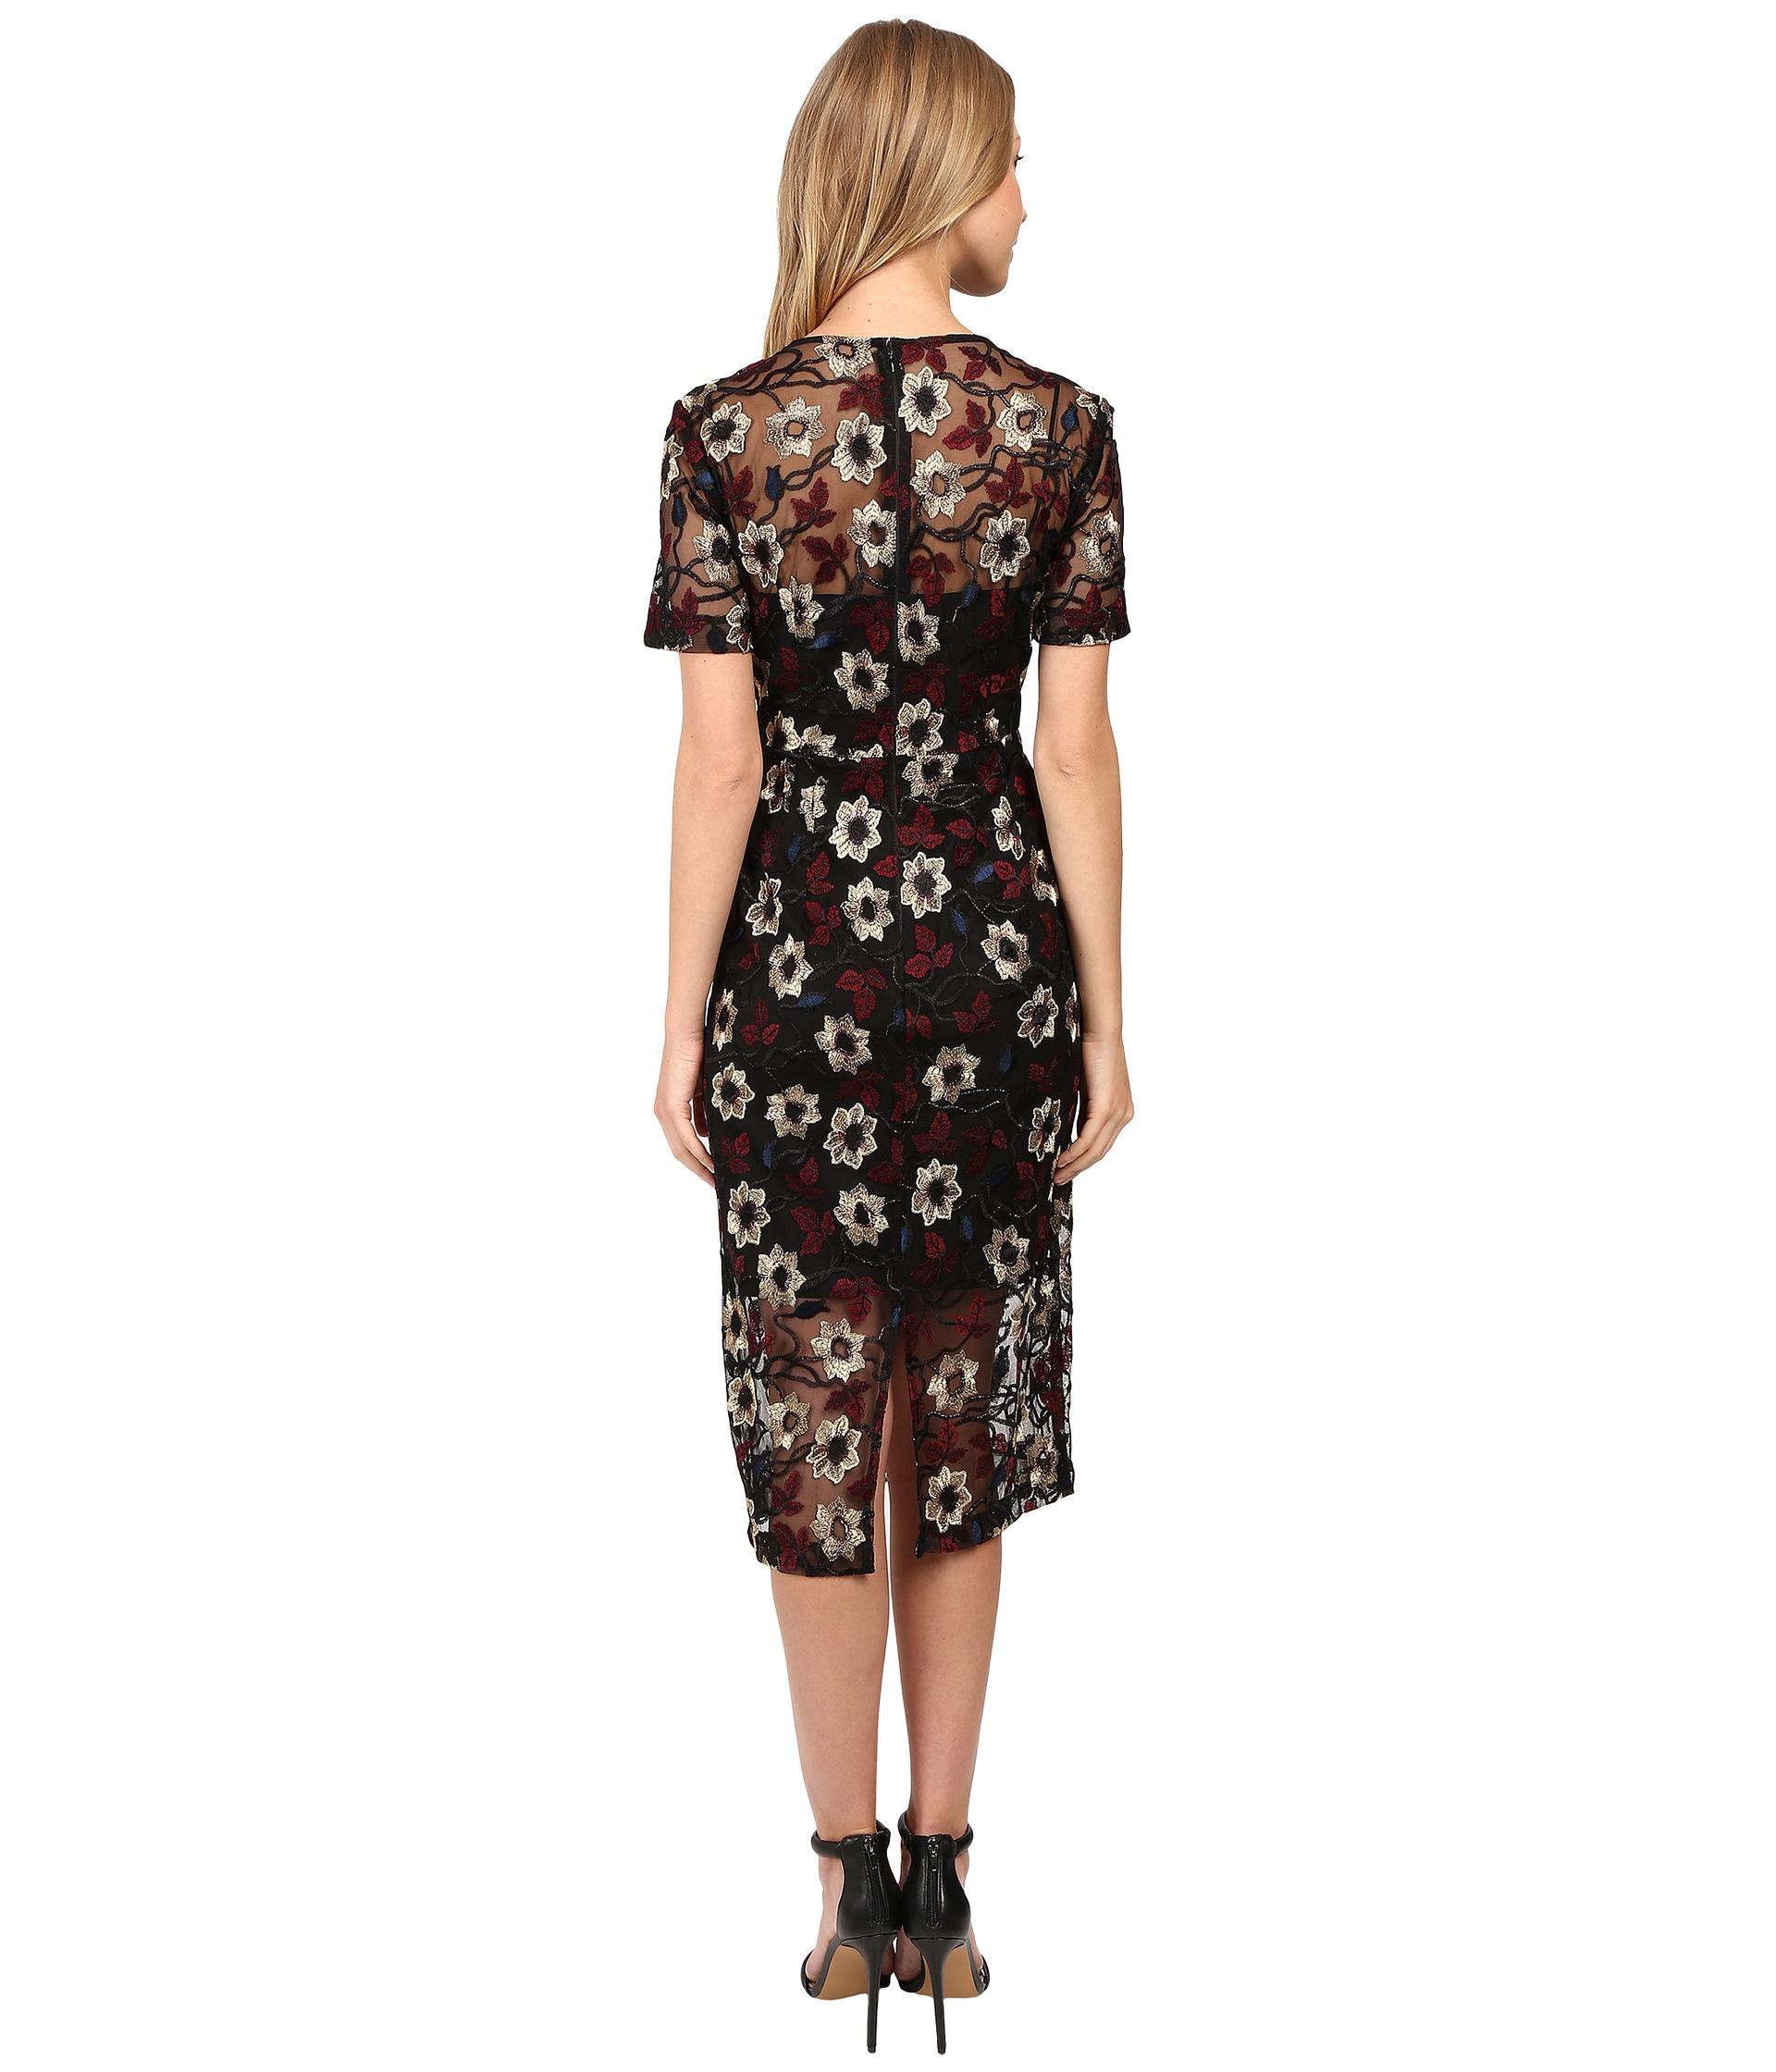 Donna morgan floral embroidered mesh dress black cos